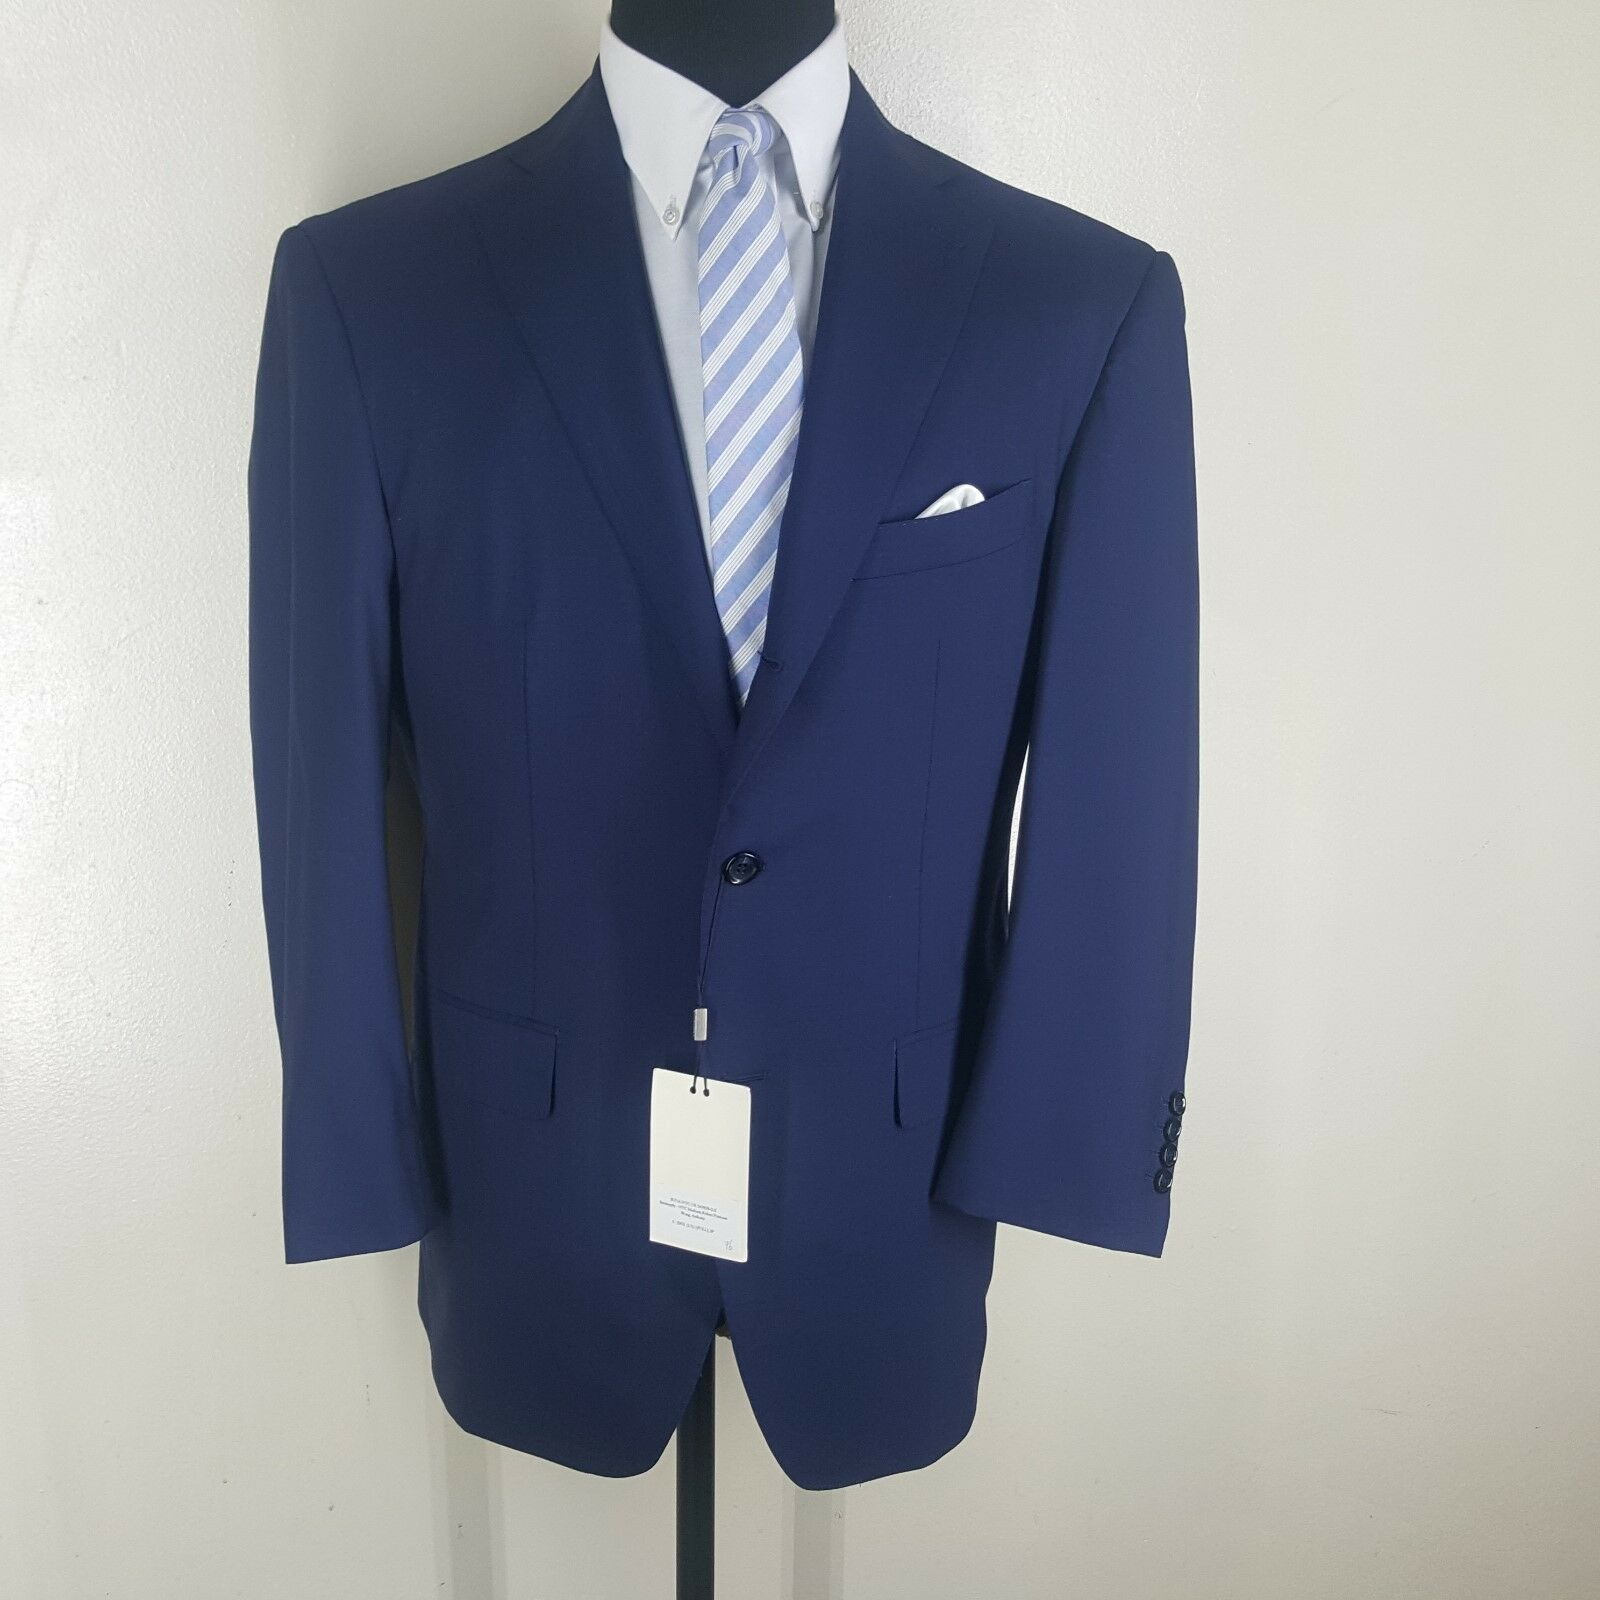 SUIT SUPPLY New Blau Blazer 3 Btn. 3 rd Button Roll Side VENTS 46R-FIT 43-44 REG